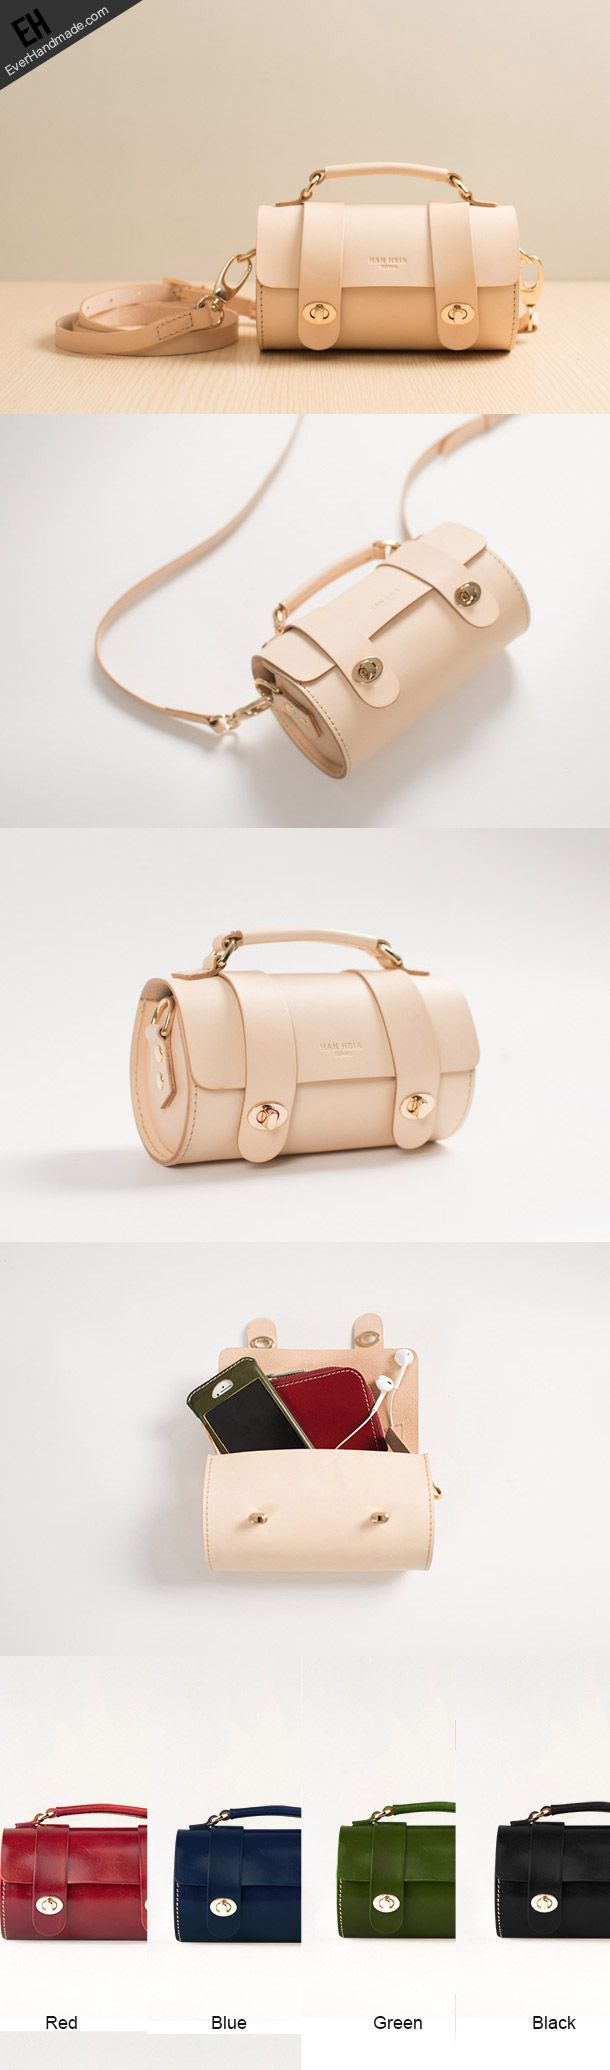 Handmade women shoulder leather bag crossbody phone bag small bag bucket bag